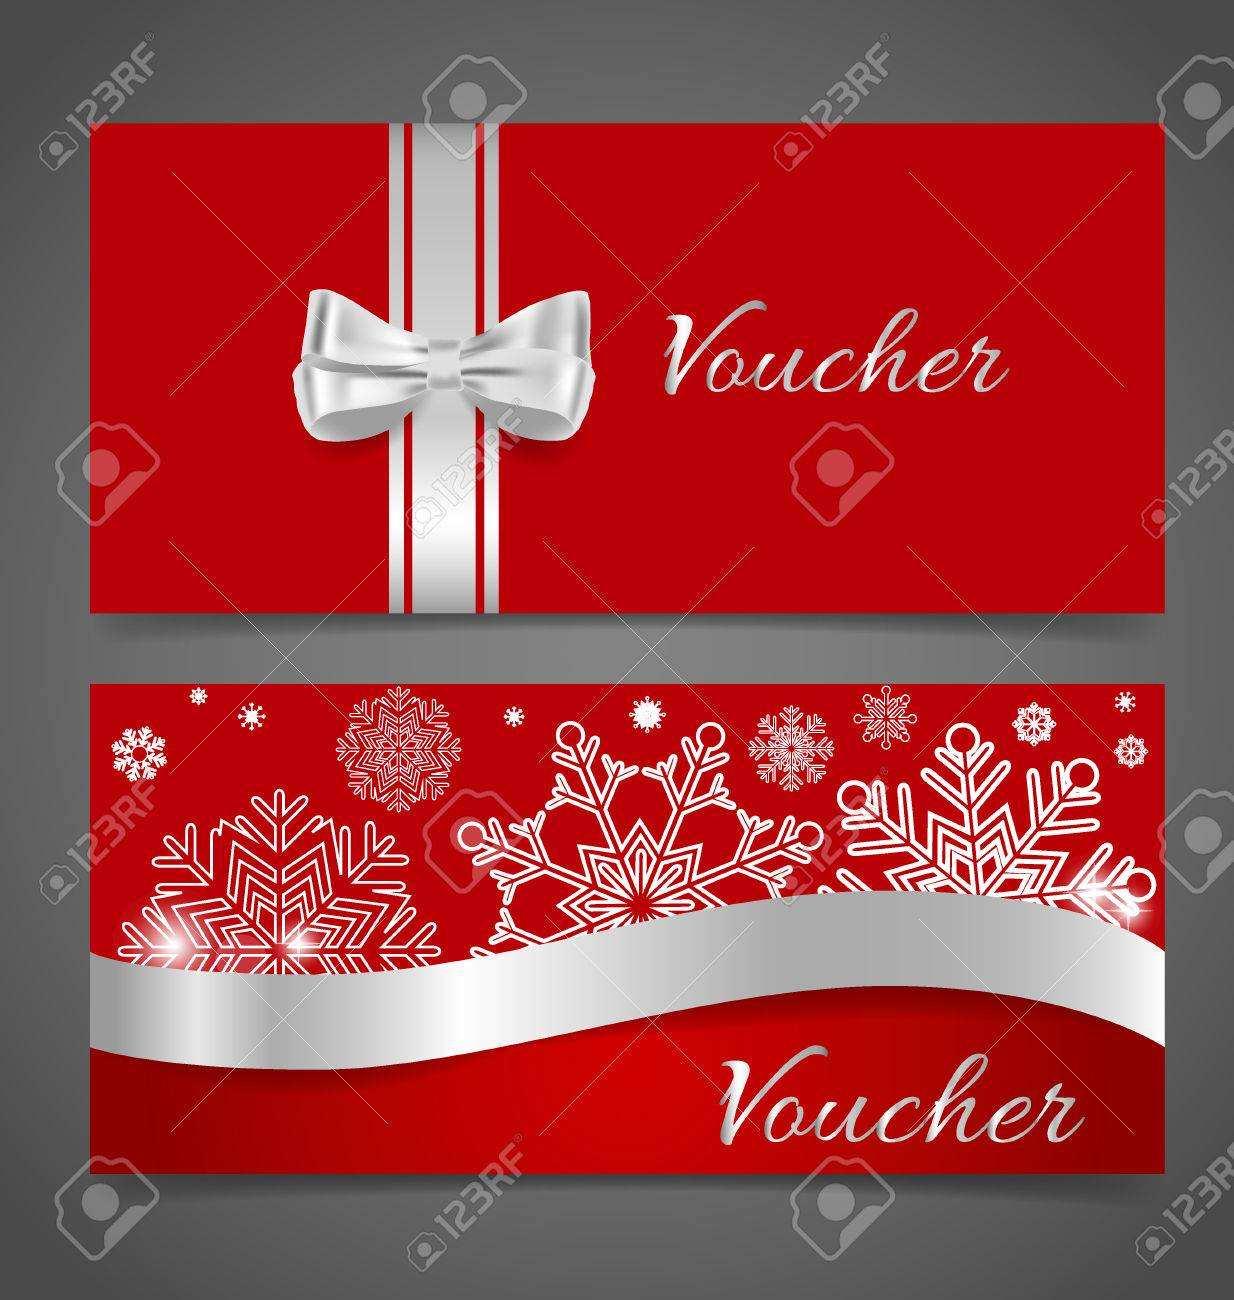 21 Visiting Christmas Savings Card Template in Photoshop with Christmas Savings Card Template